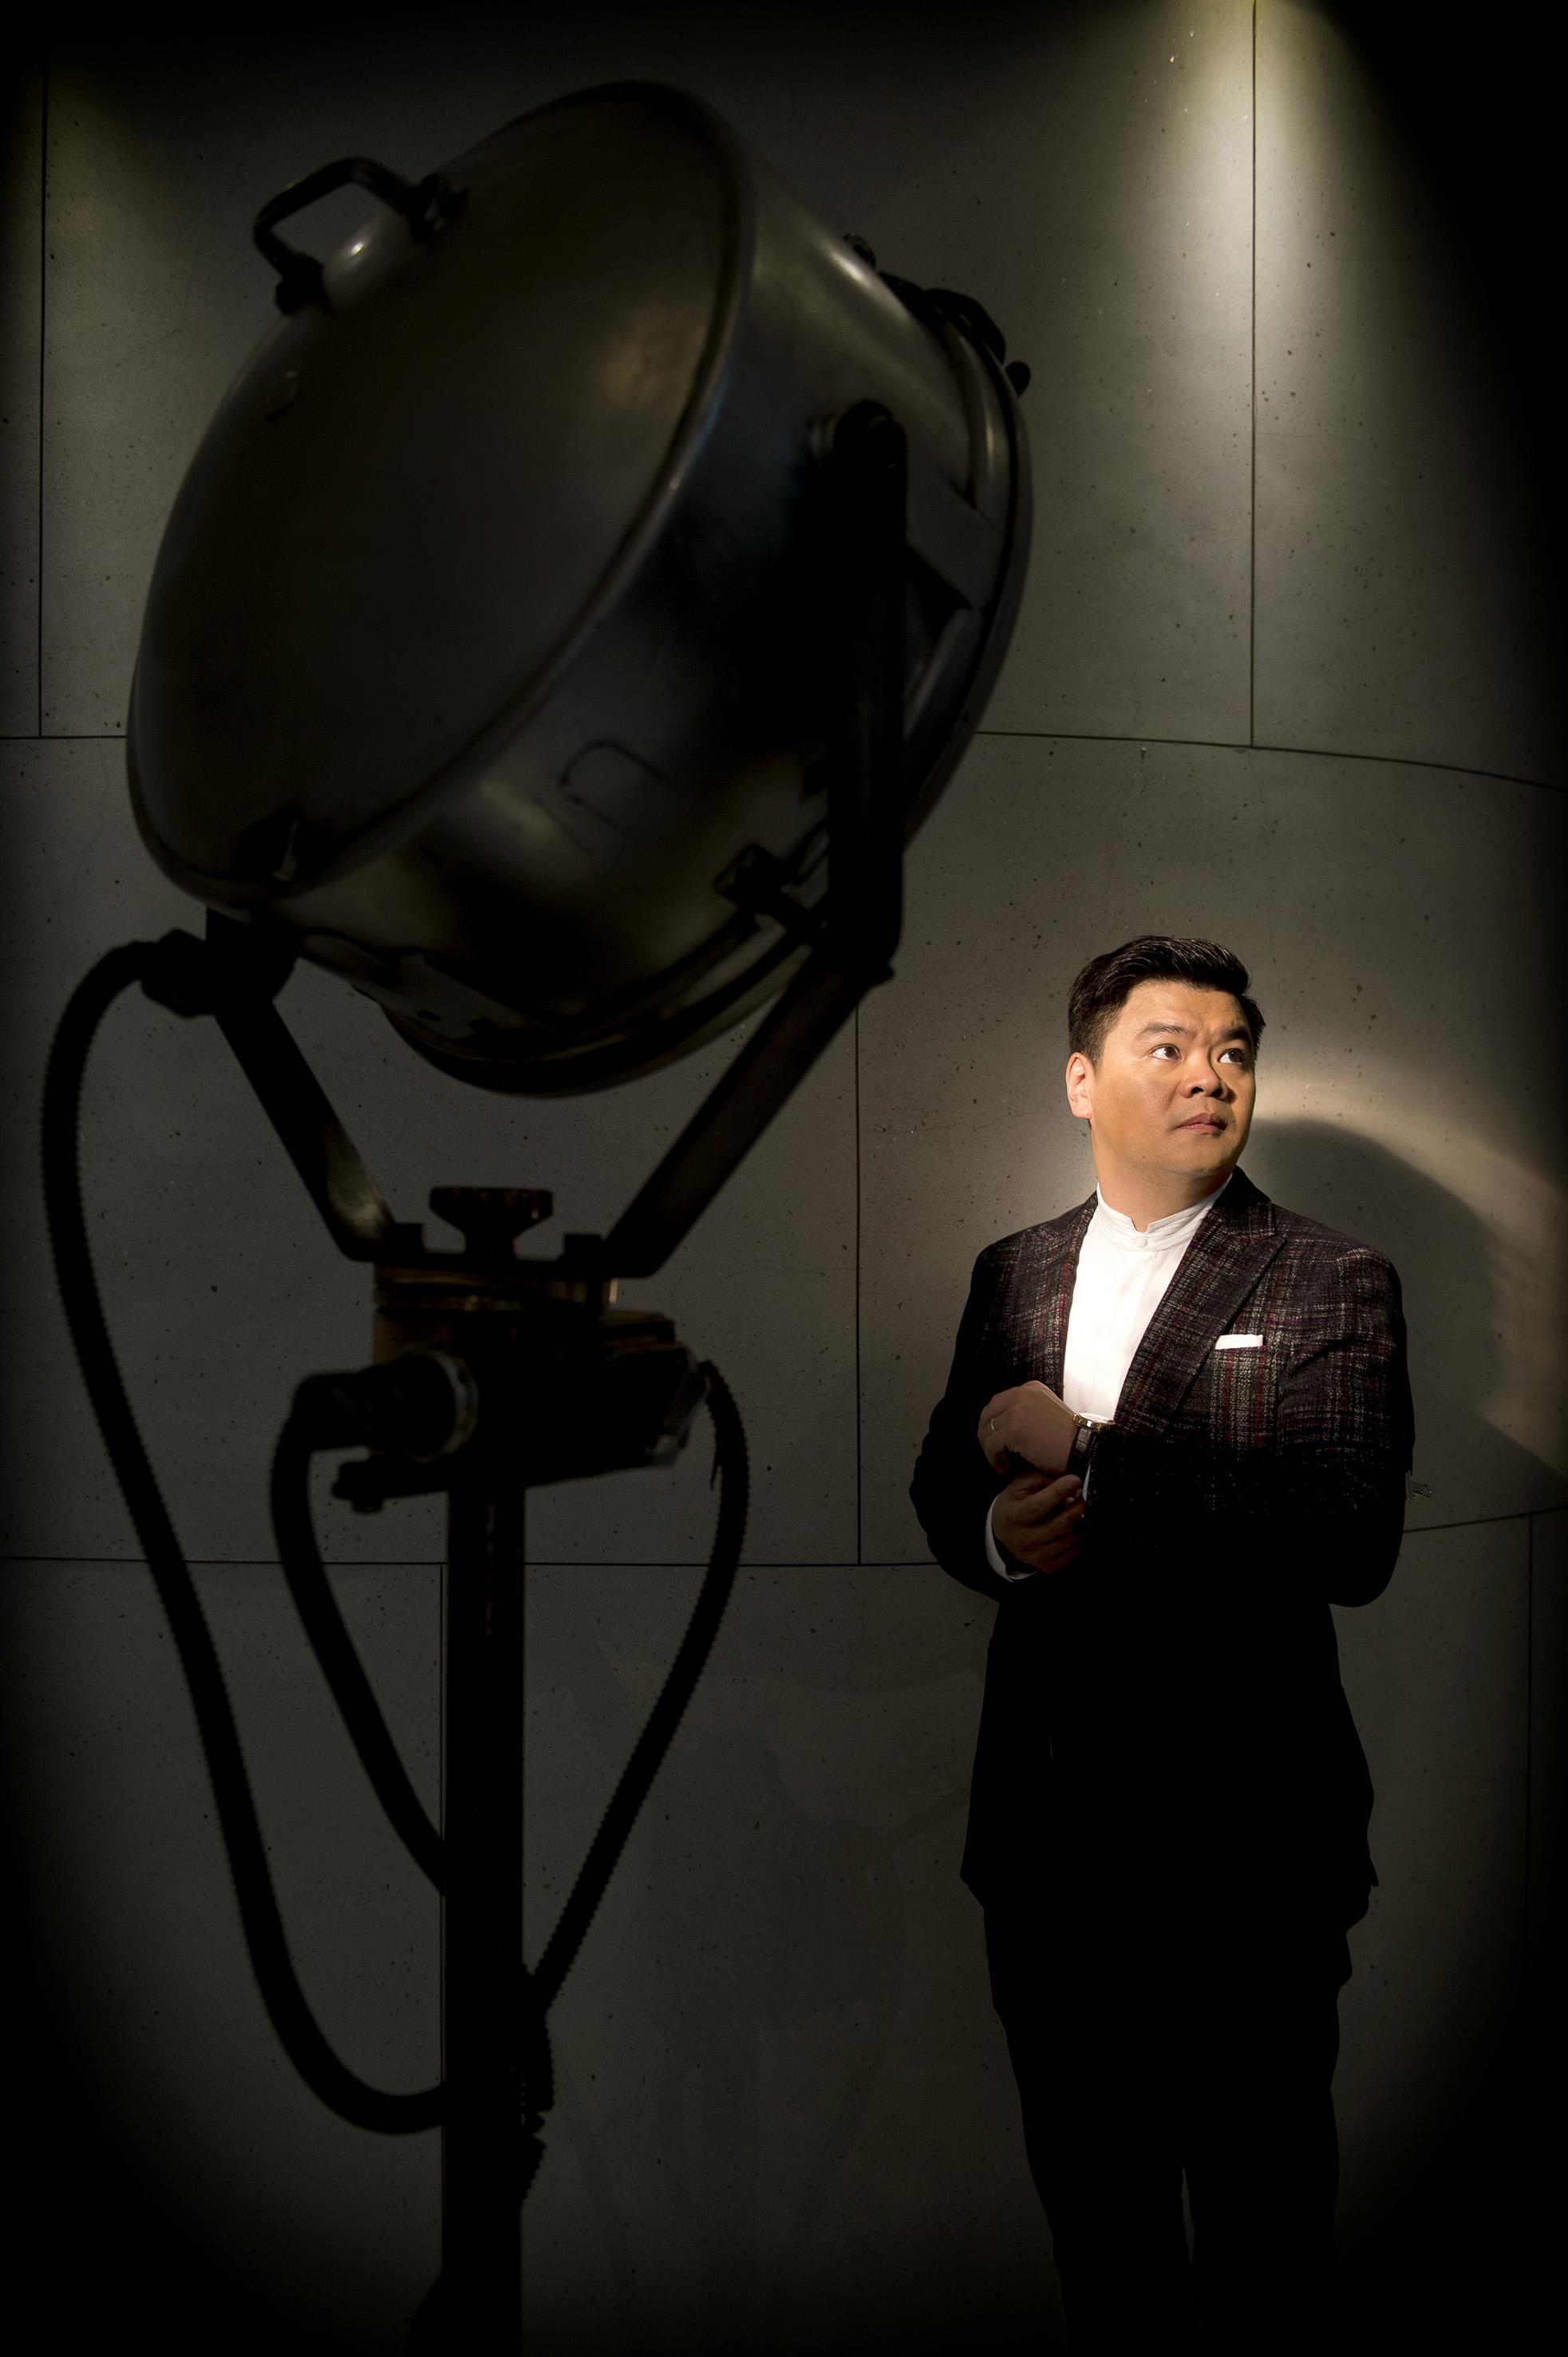 Loh Lik Peng: Restauranteur and Hotelier, Unlisted Collection